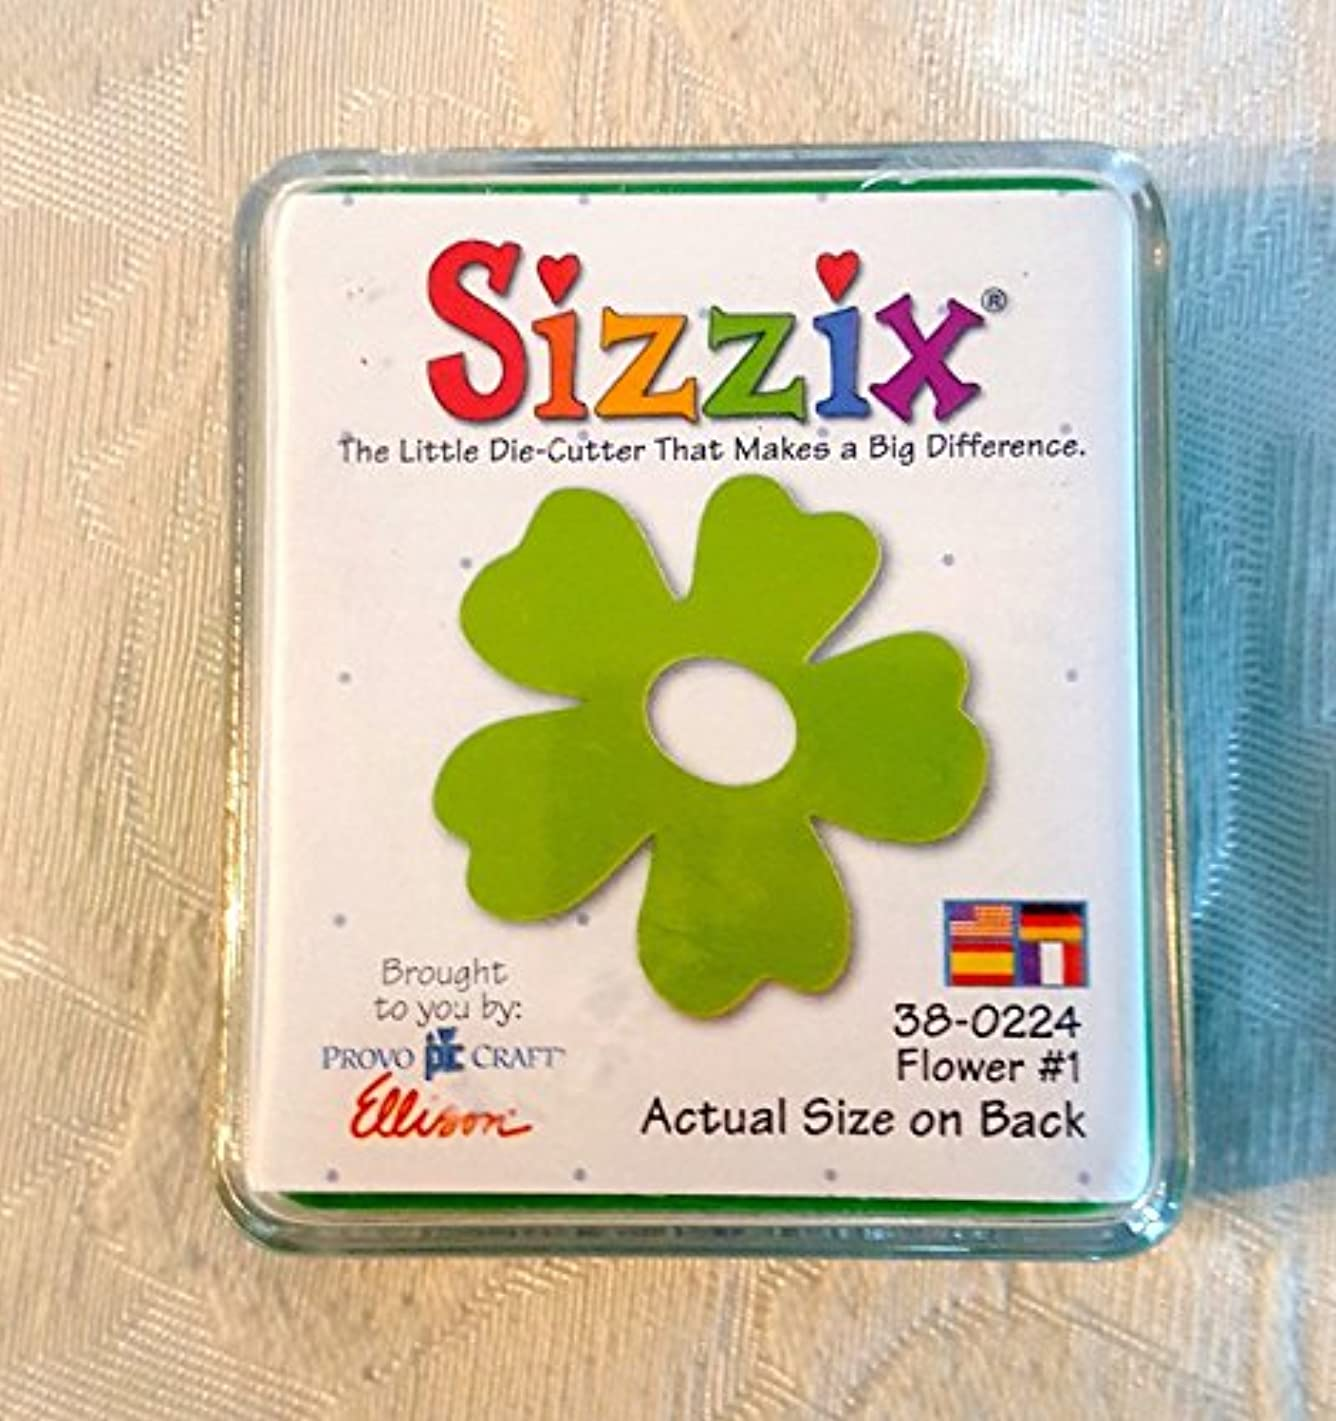 Sizzix Flower # 1 Die Cut